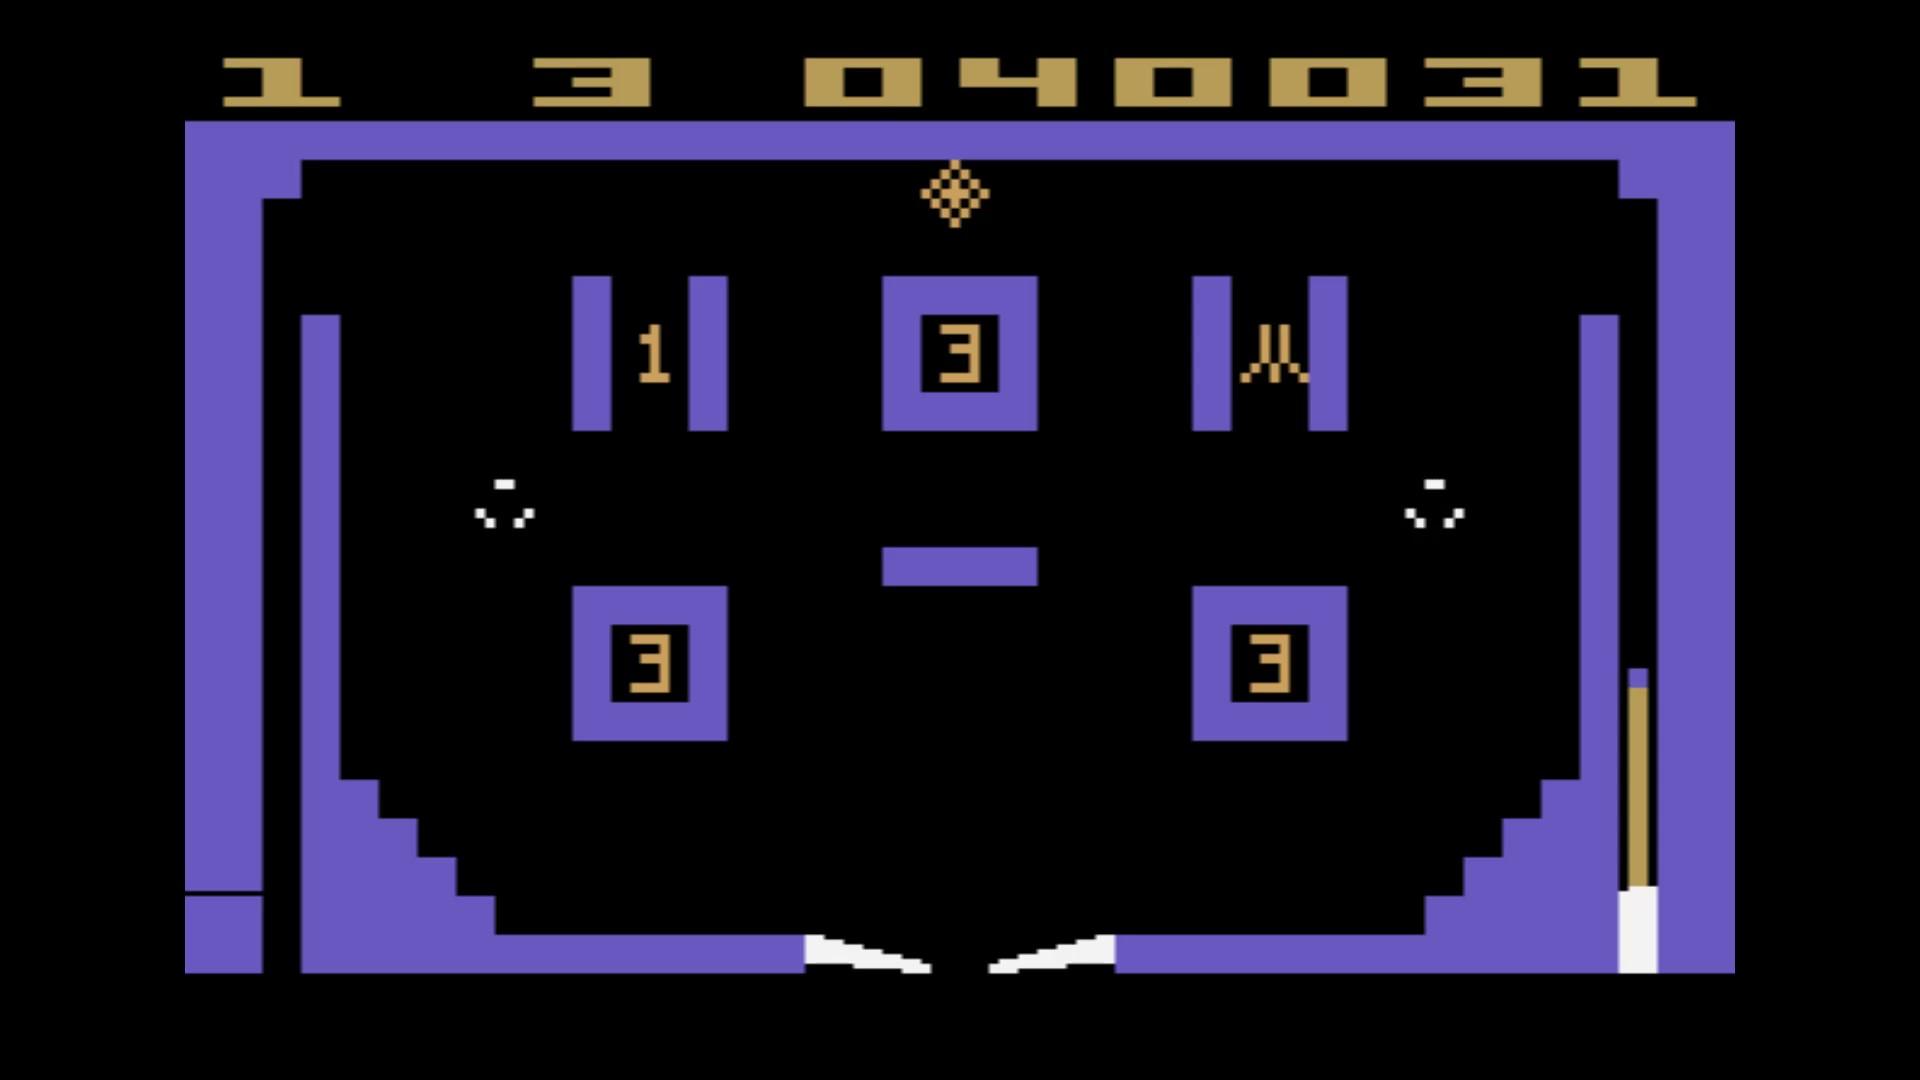 AkinNahtanoj: Video Pinball (Atari 2600 Emulated Novice/B Mode) 40,031 points on 2020-08-10 15:14:14